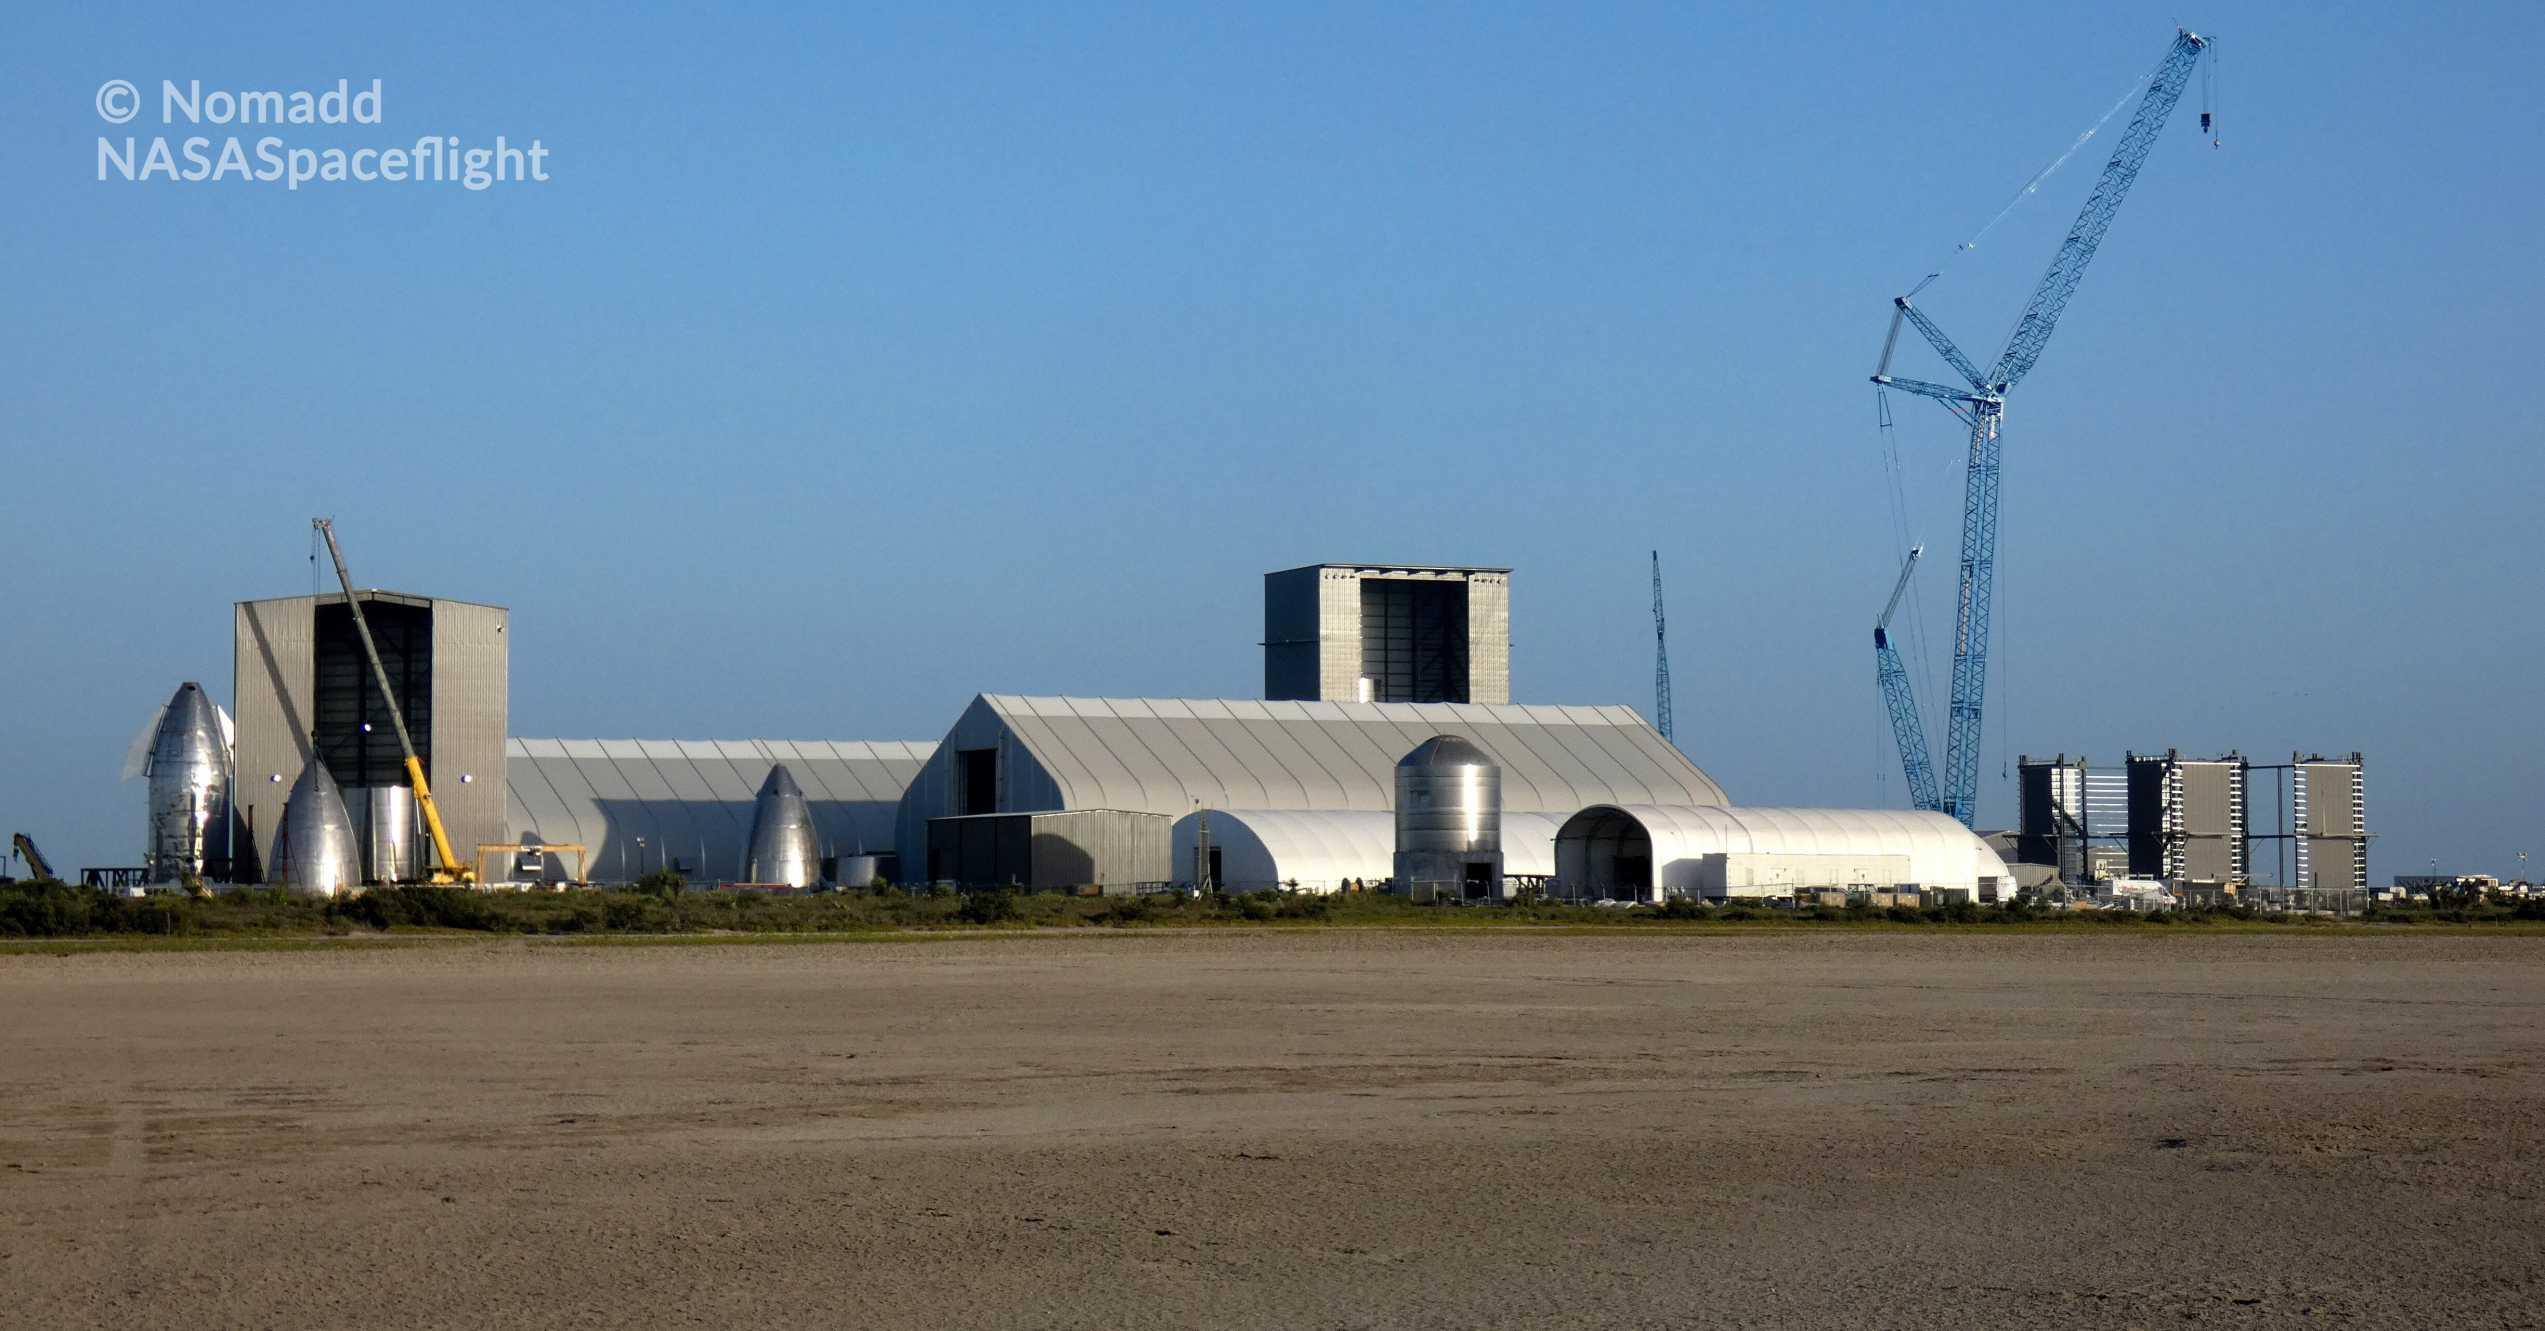 Starship Boca Chica 071320 (NASASpaceflight – Nomadd) factory overview 1 crop (c)